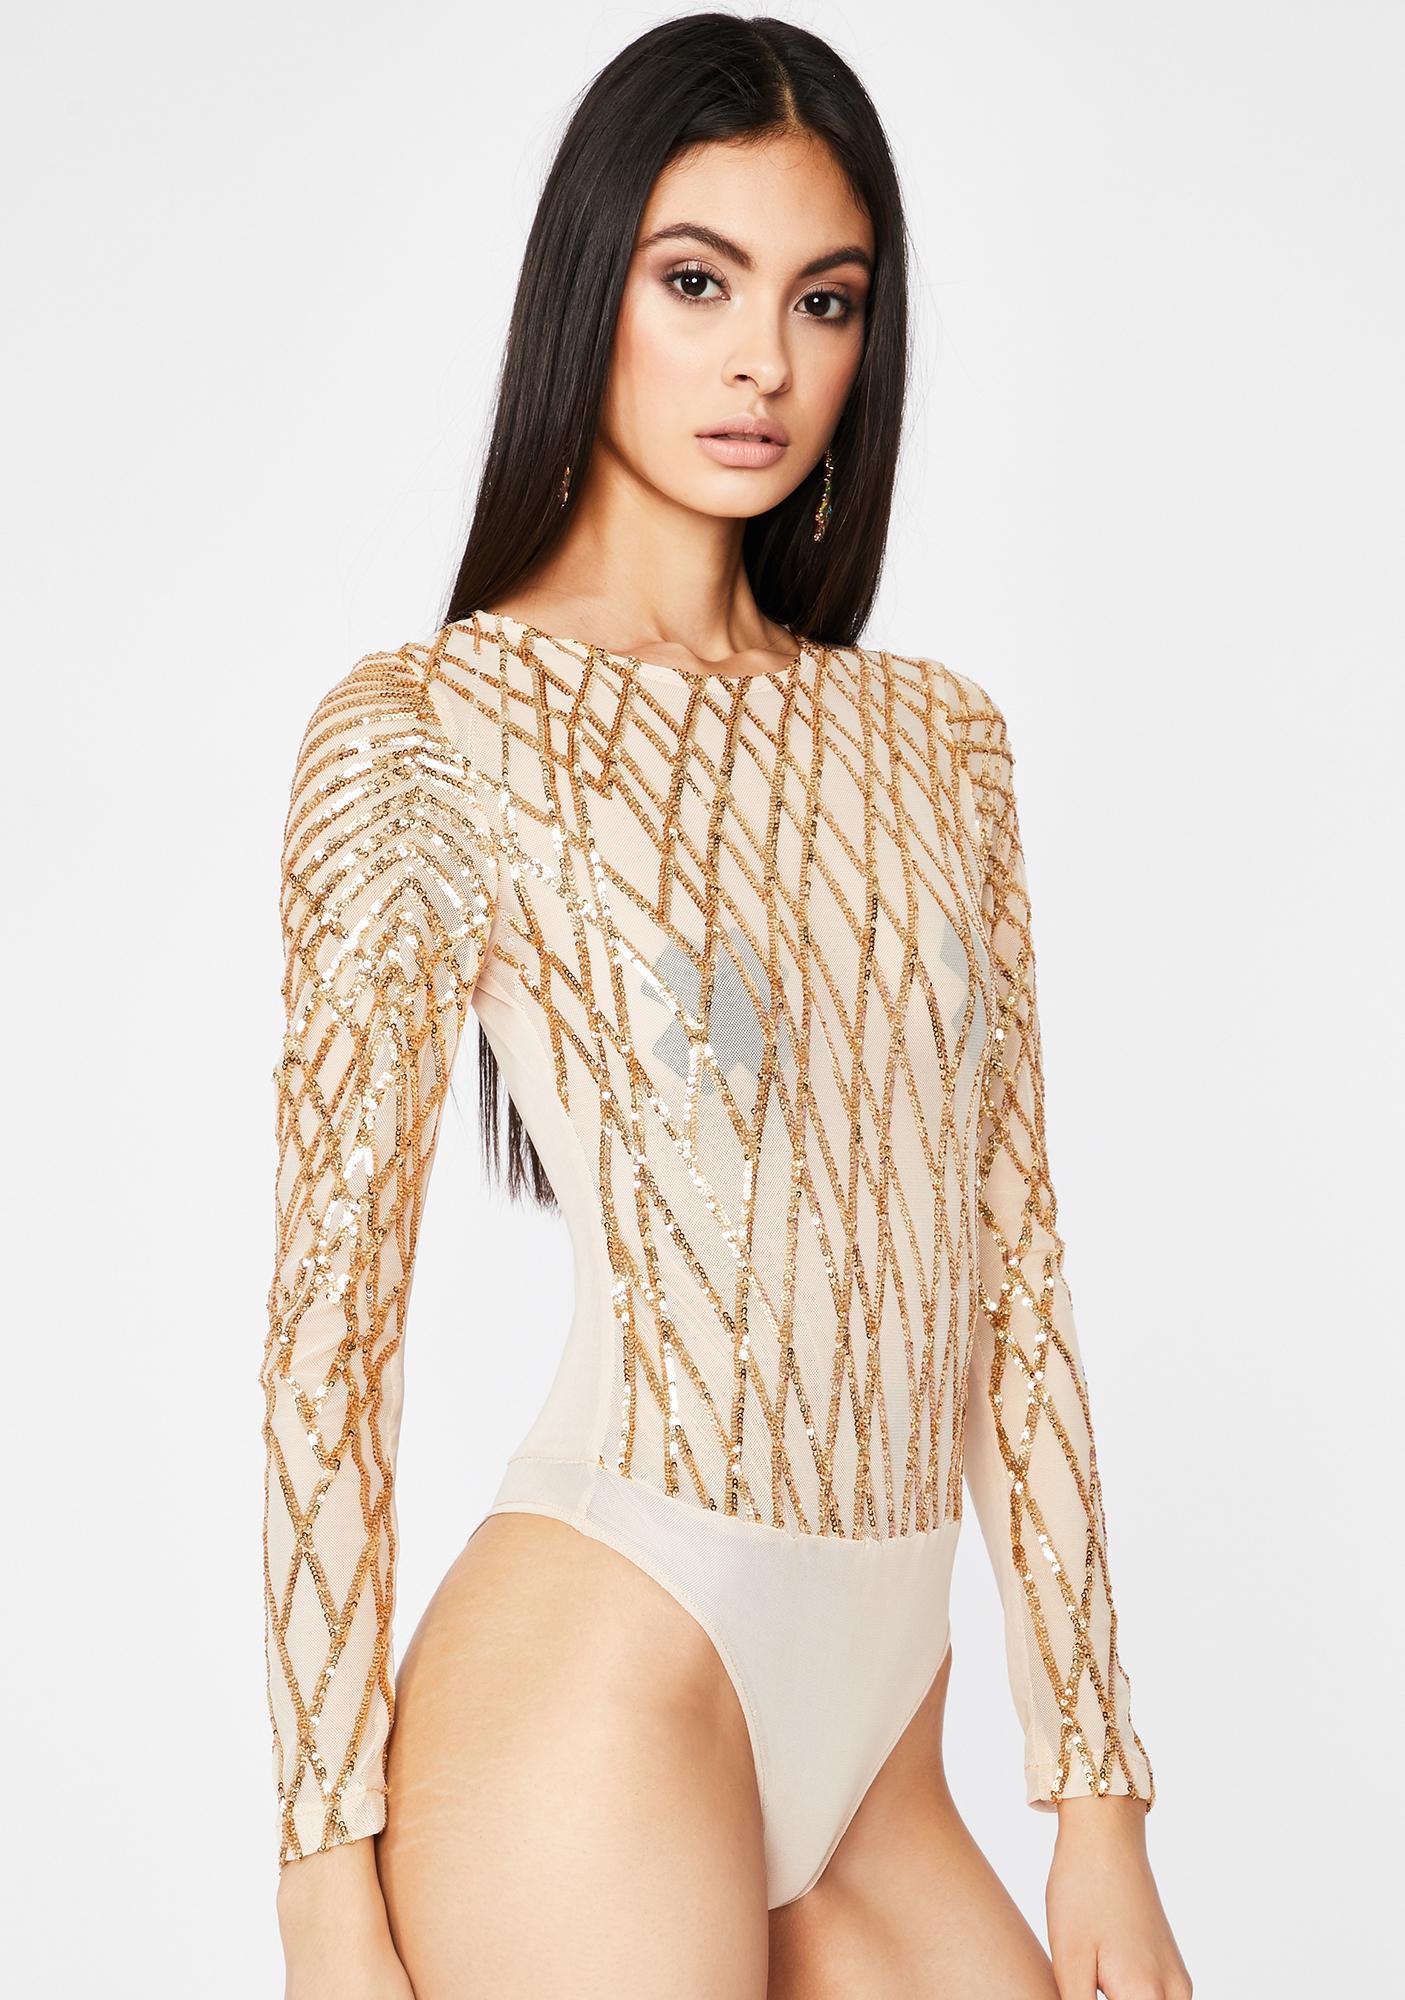 Gilded Complicated Crush Sequin Bodysuit